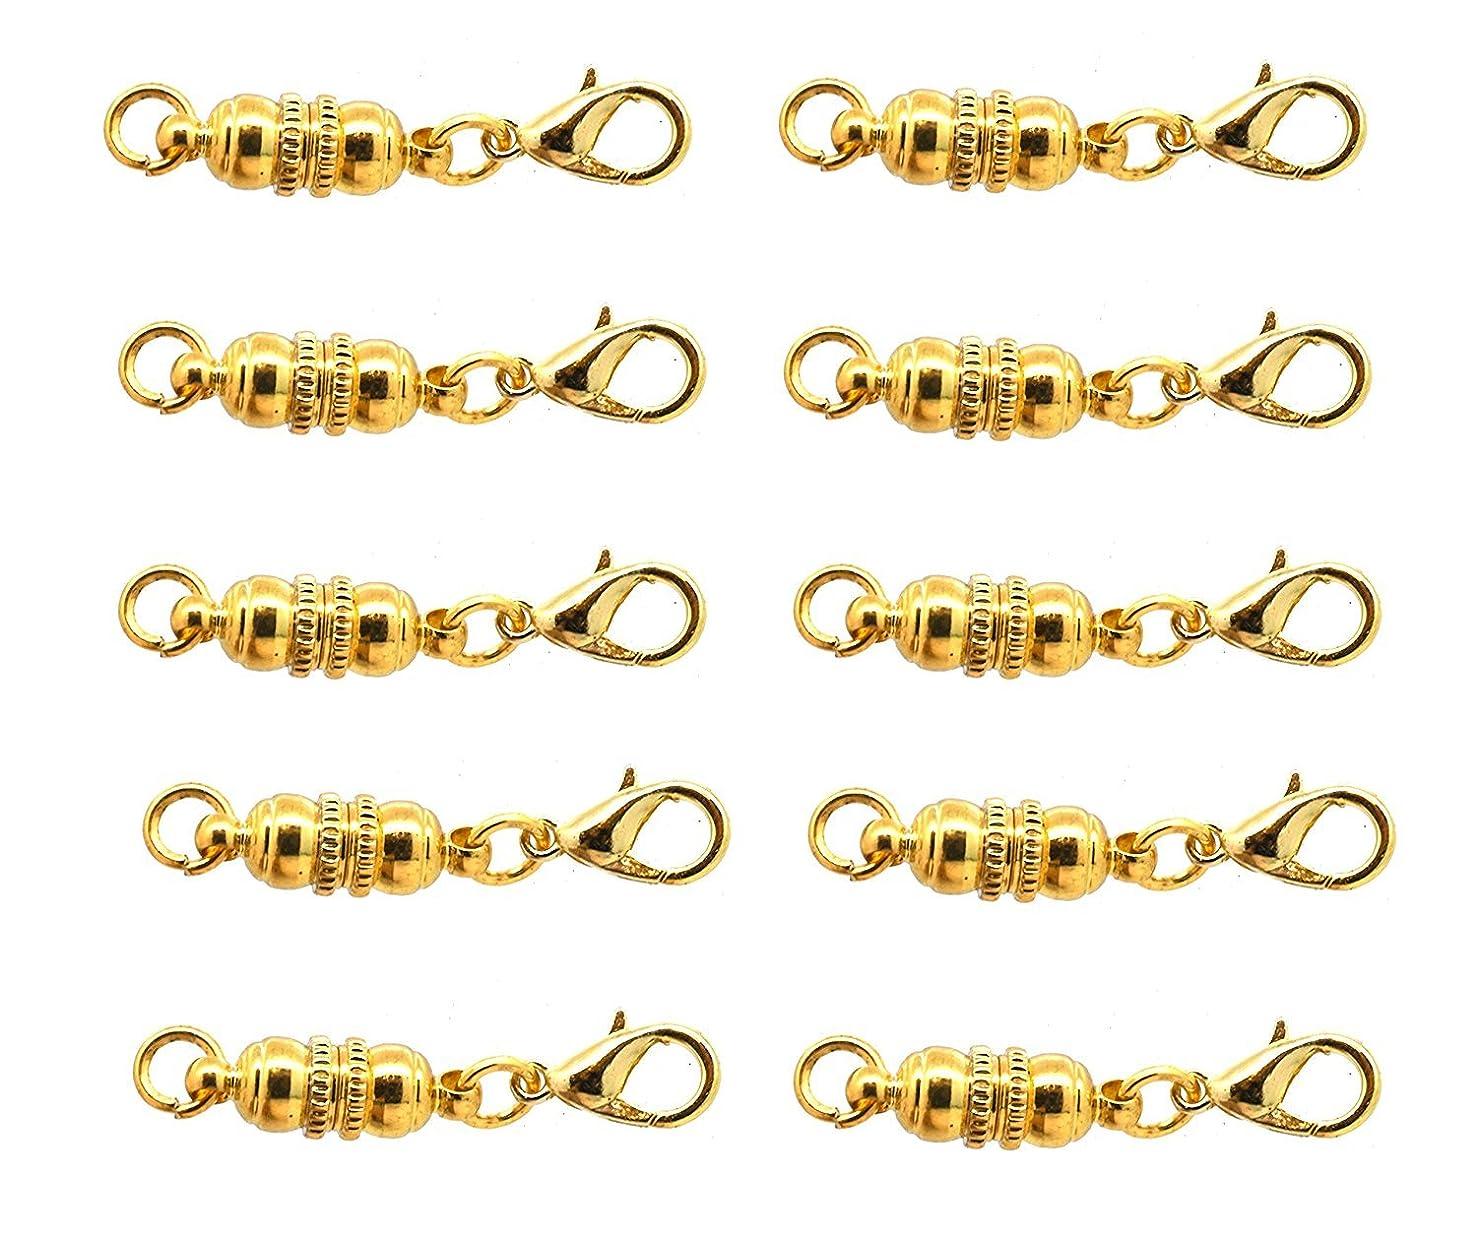 SPARIK ENJOY (TM) 10 pcs Gold Tone Jewelry Making Magnetic Hooks Necklace Extenders Magnetic Jewelry Extenders for bracelets, & necklaces (Unique Gold Tone)